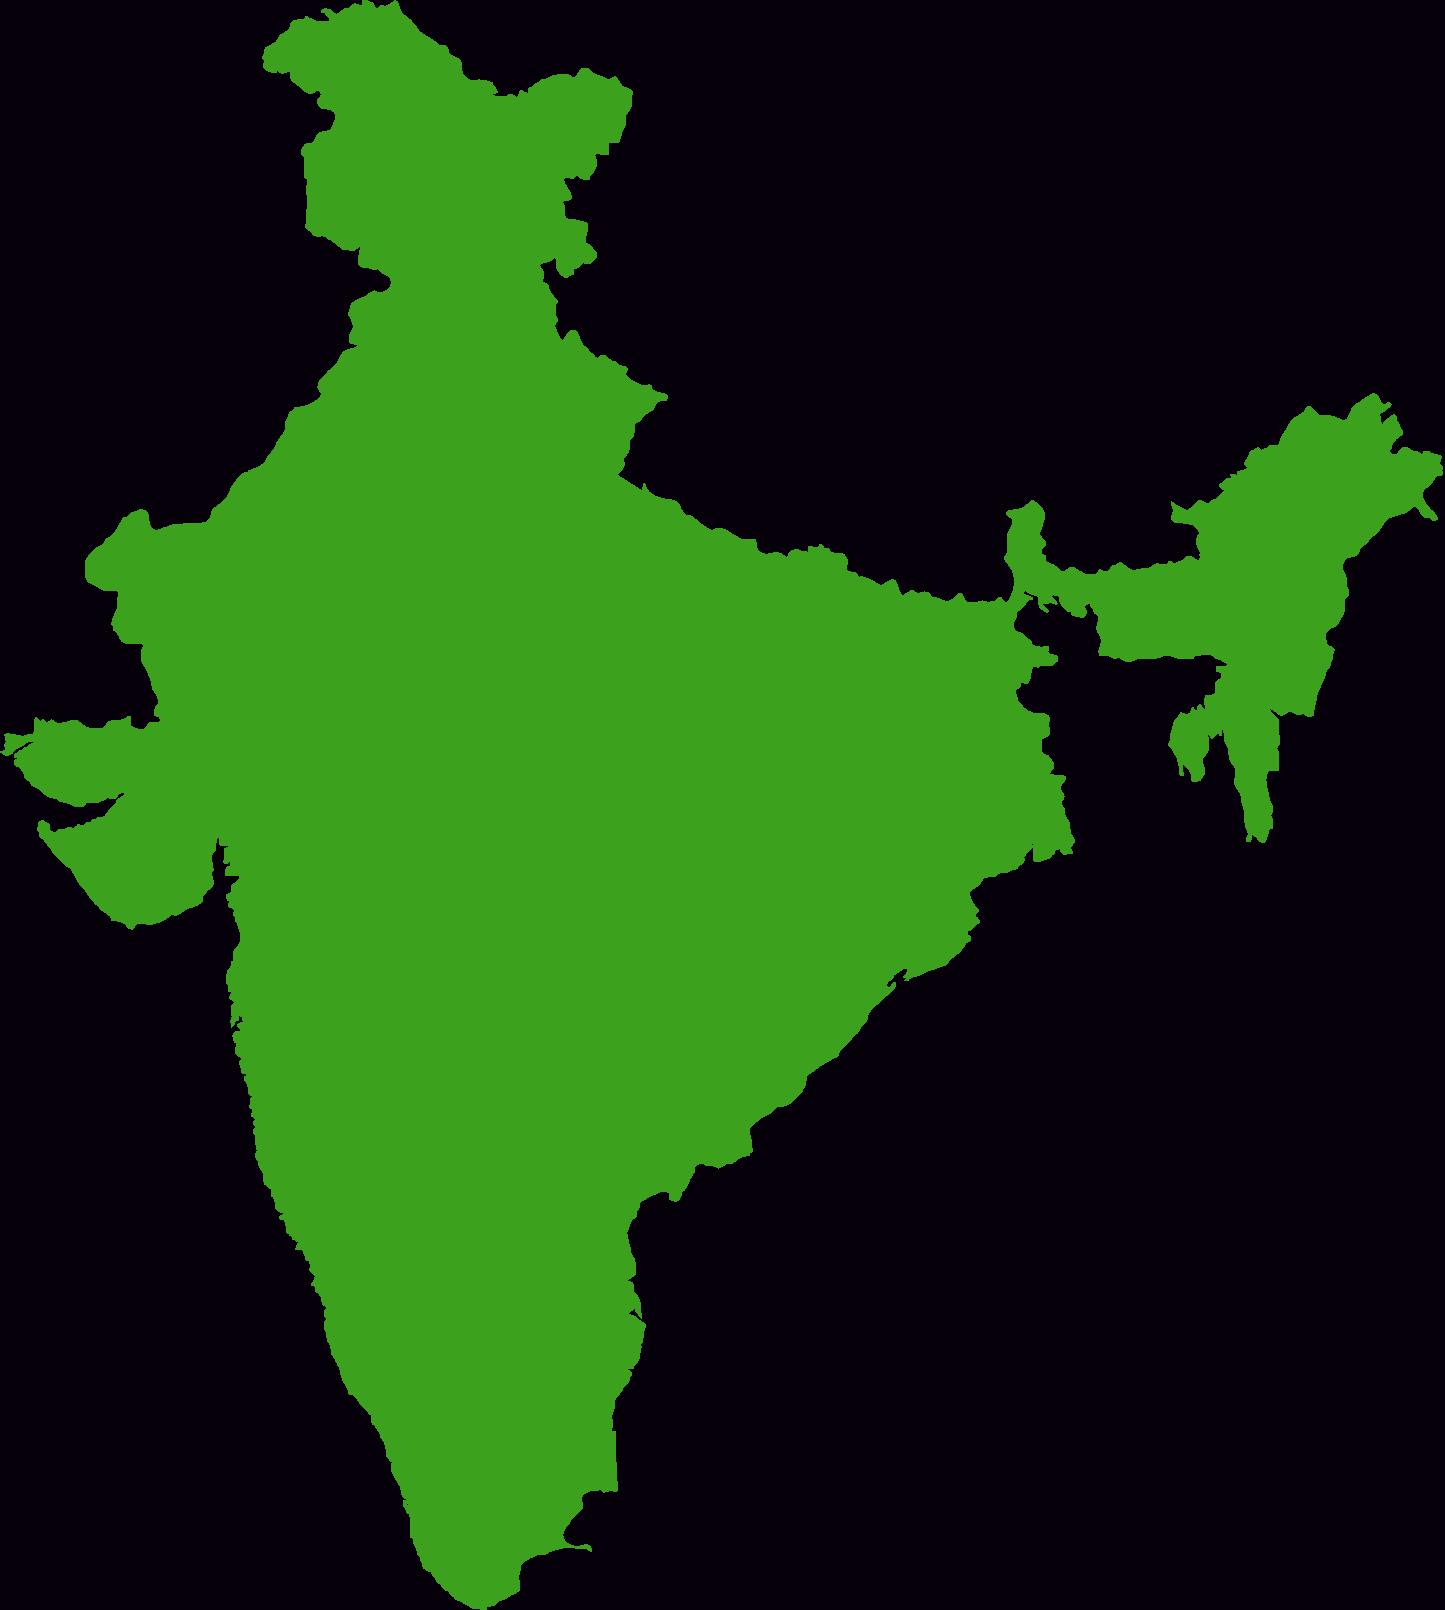 Fileindia coor locatorg wikipedia fileindia coor locatorg gumiabroncs Choice Image